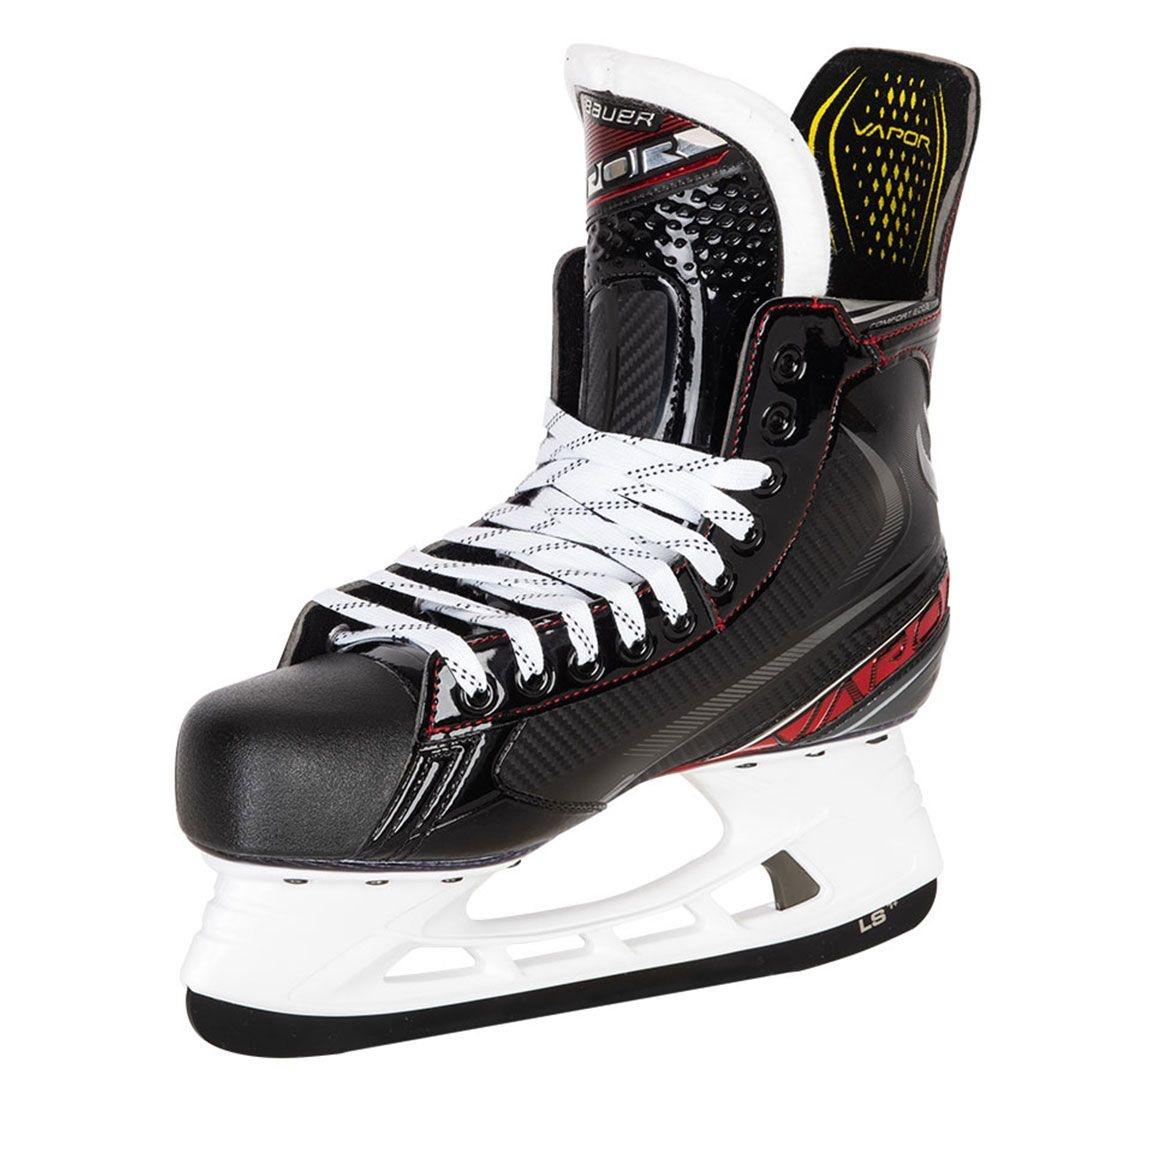 Bauer Hockey 2019 BAUER SK VAPOR XLTX PRO JR SKATES